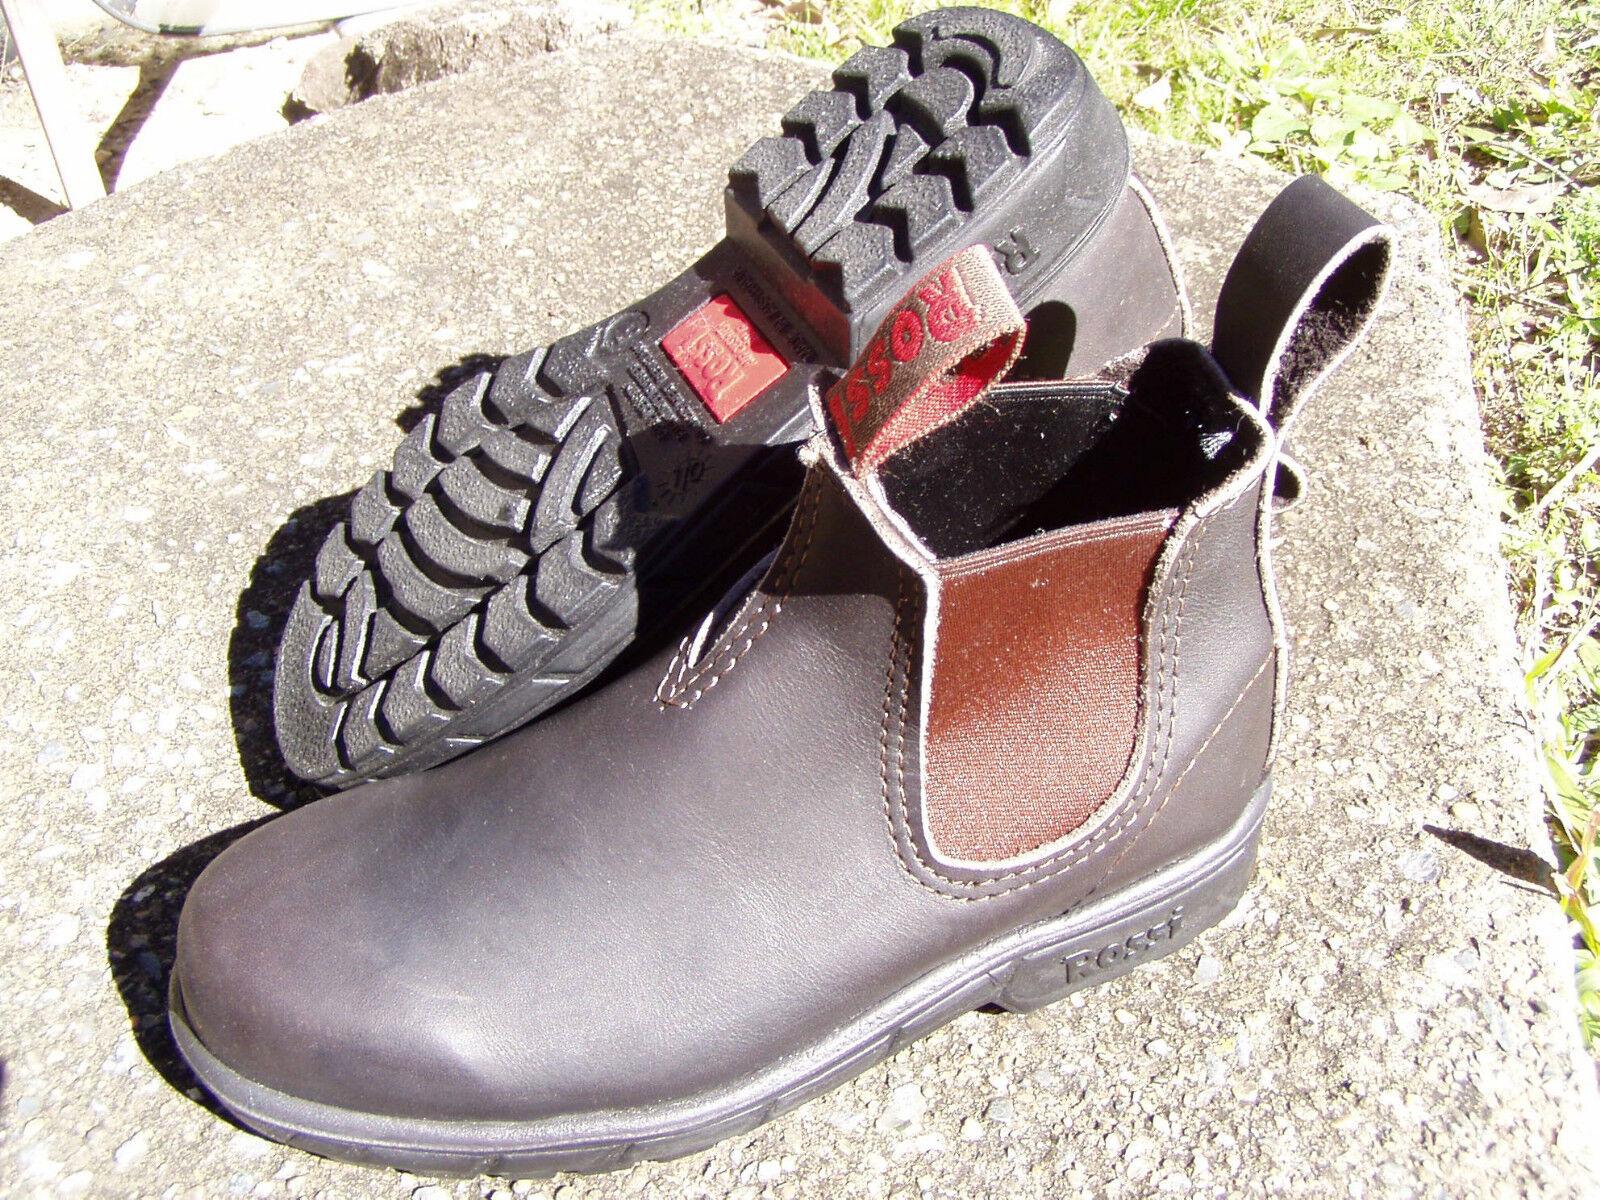 Scarpe casual da uomo  ROSSI Endura 303 Dark Brown (Claret) Boot. New, Unworn